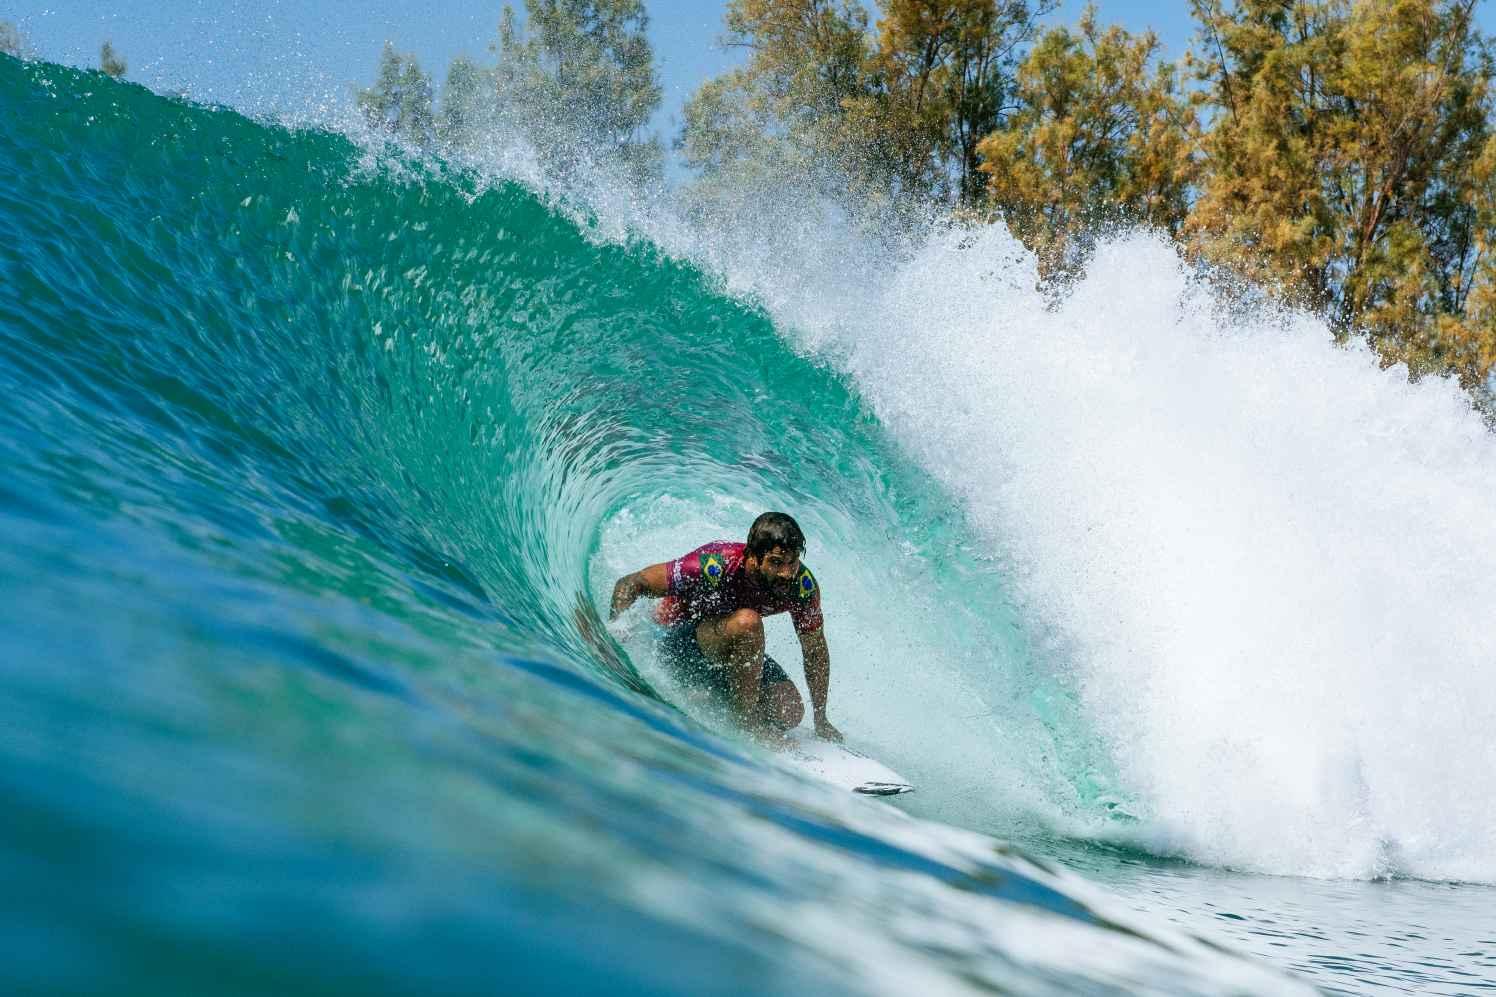 surf30 surf ranch pro 2021 wsl surf Ferreira I Ranch21 PNN 2425